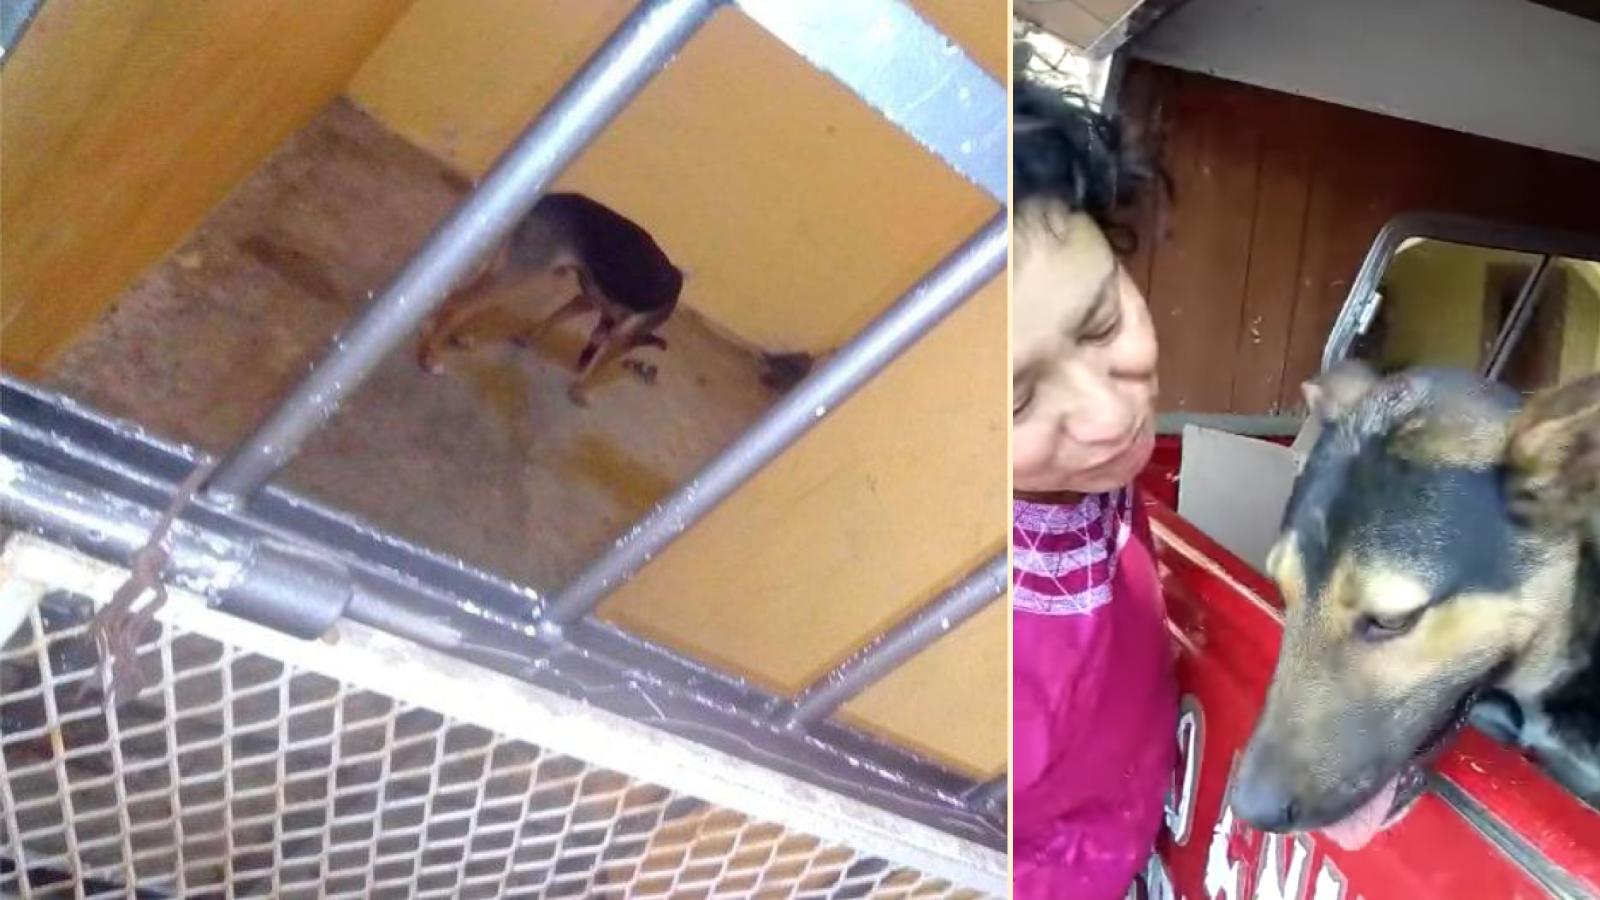 Alcalde de Oaxaca encarcela a perro. Organizaciones logran liberarlo